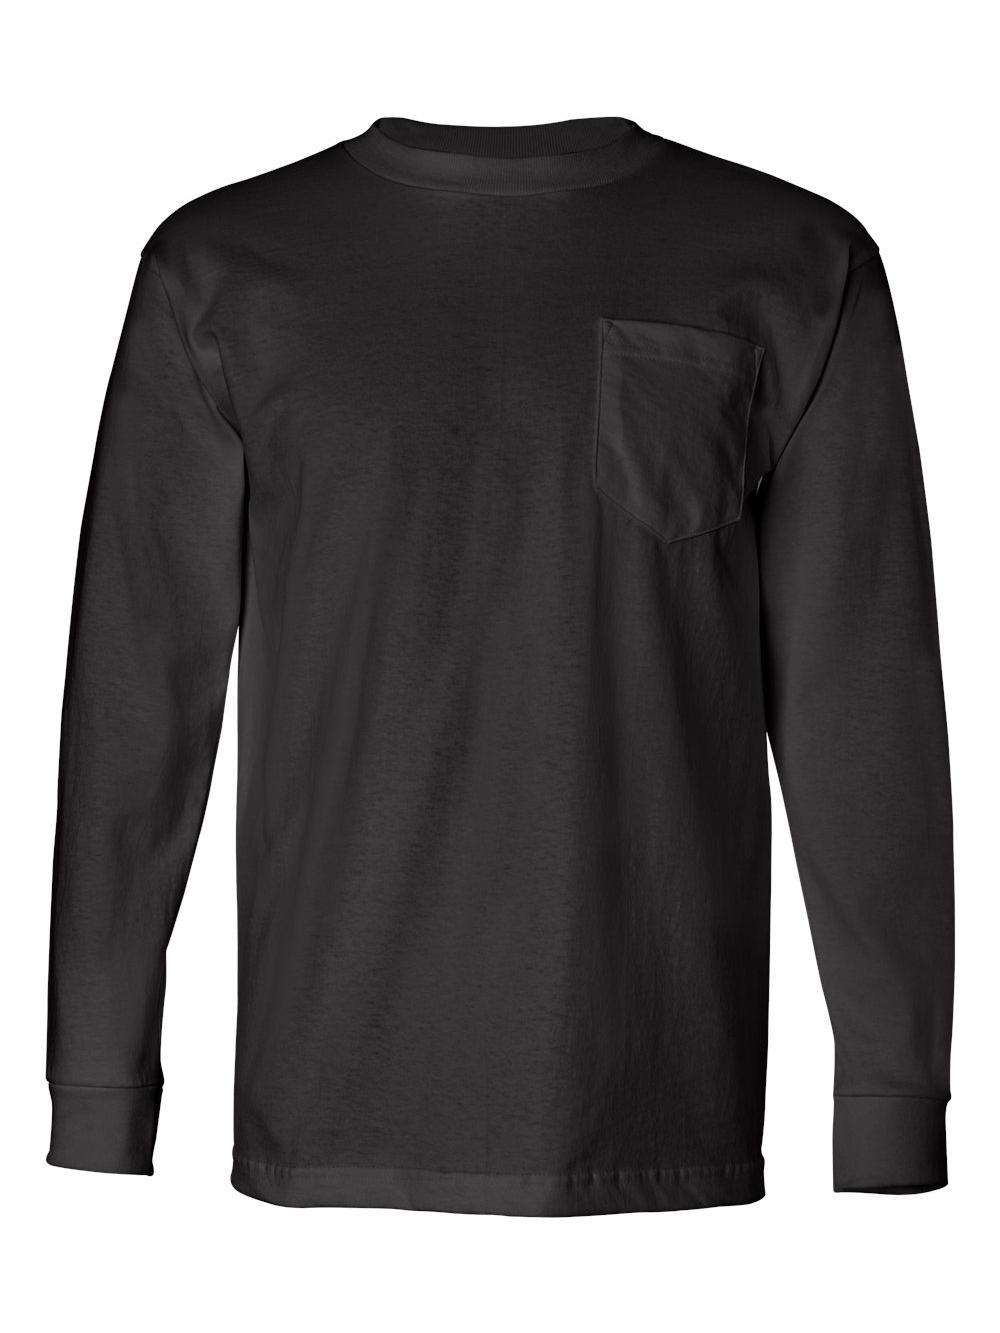 Bayside-USA-Made-Long-Sleeve-T-Shirt-with-a-Pocket-8100 thumbnail 6